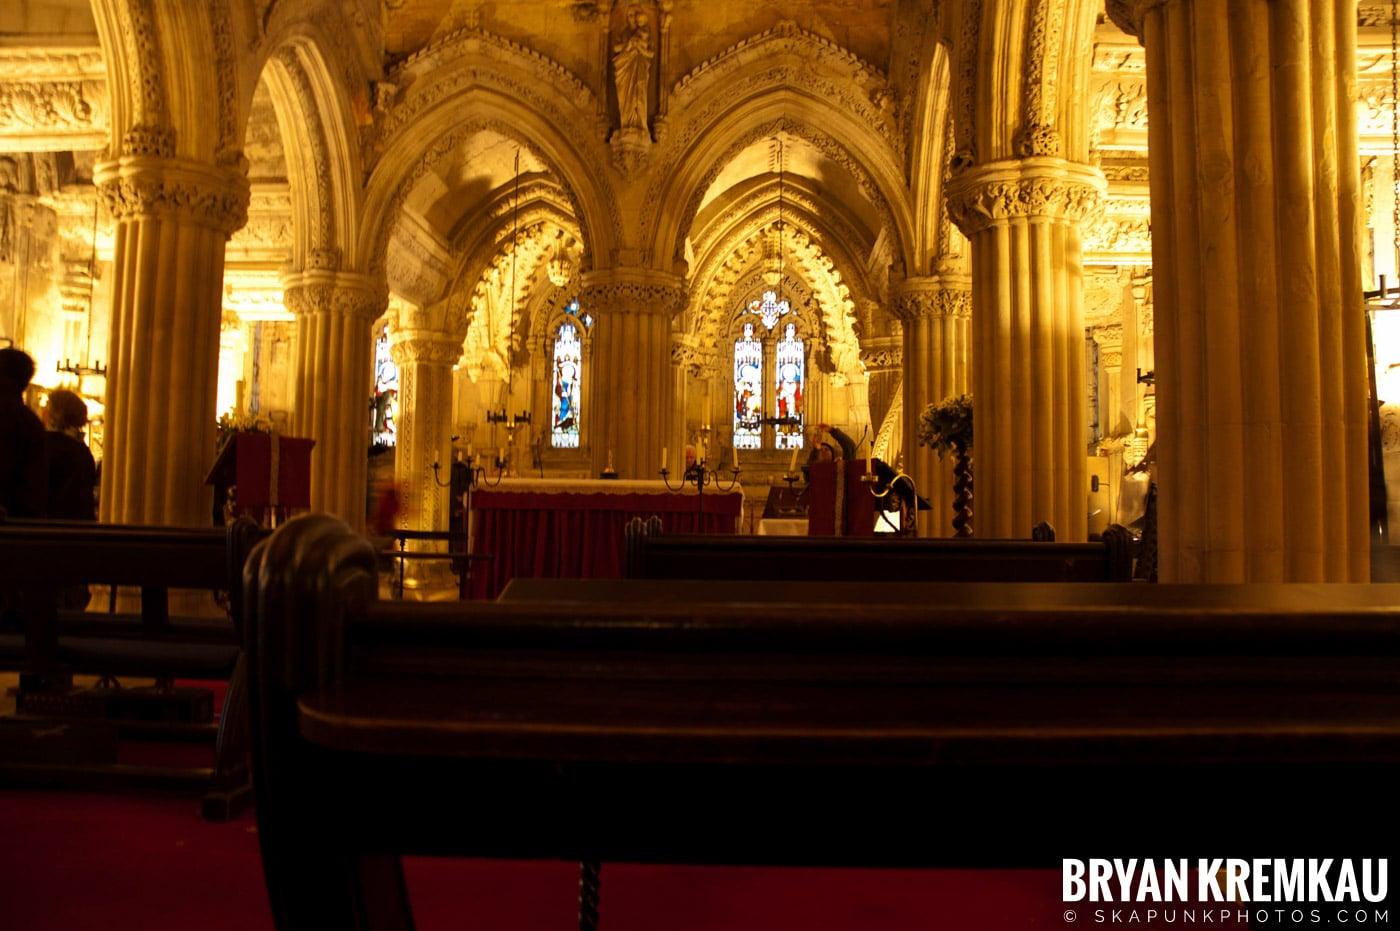 Edinburgh, Scotland - Day 4 - 12.15.06 (4)